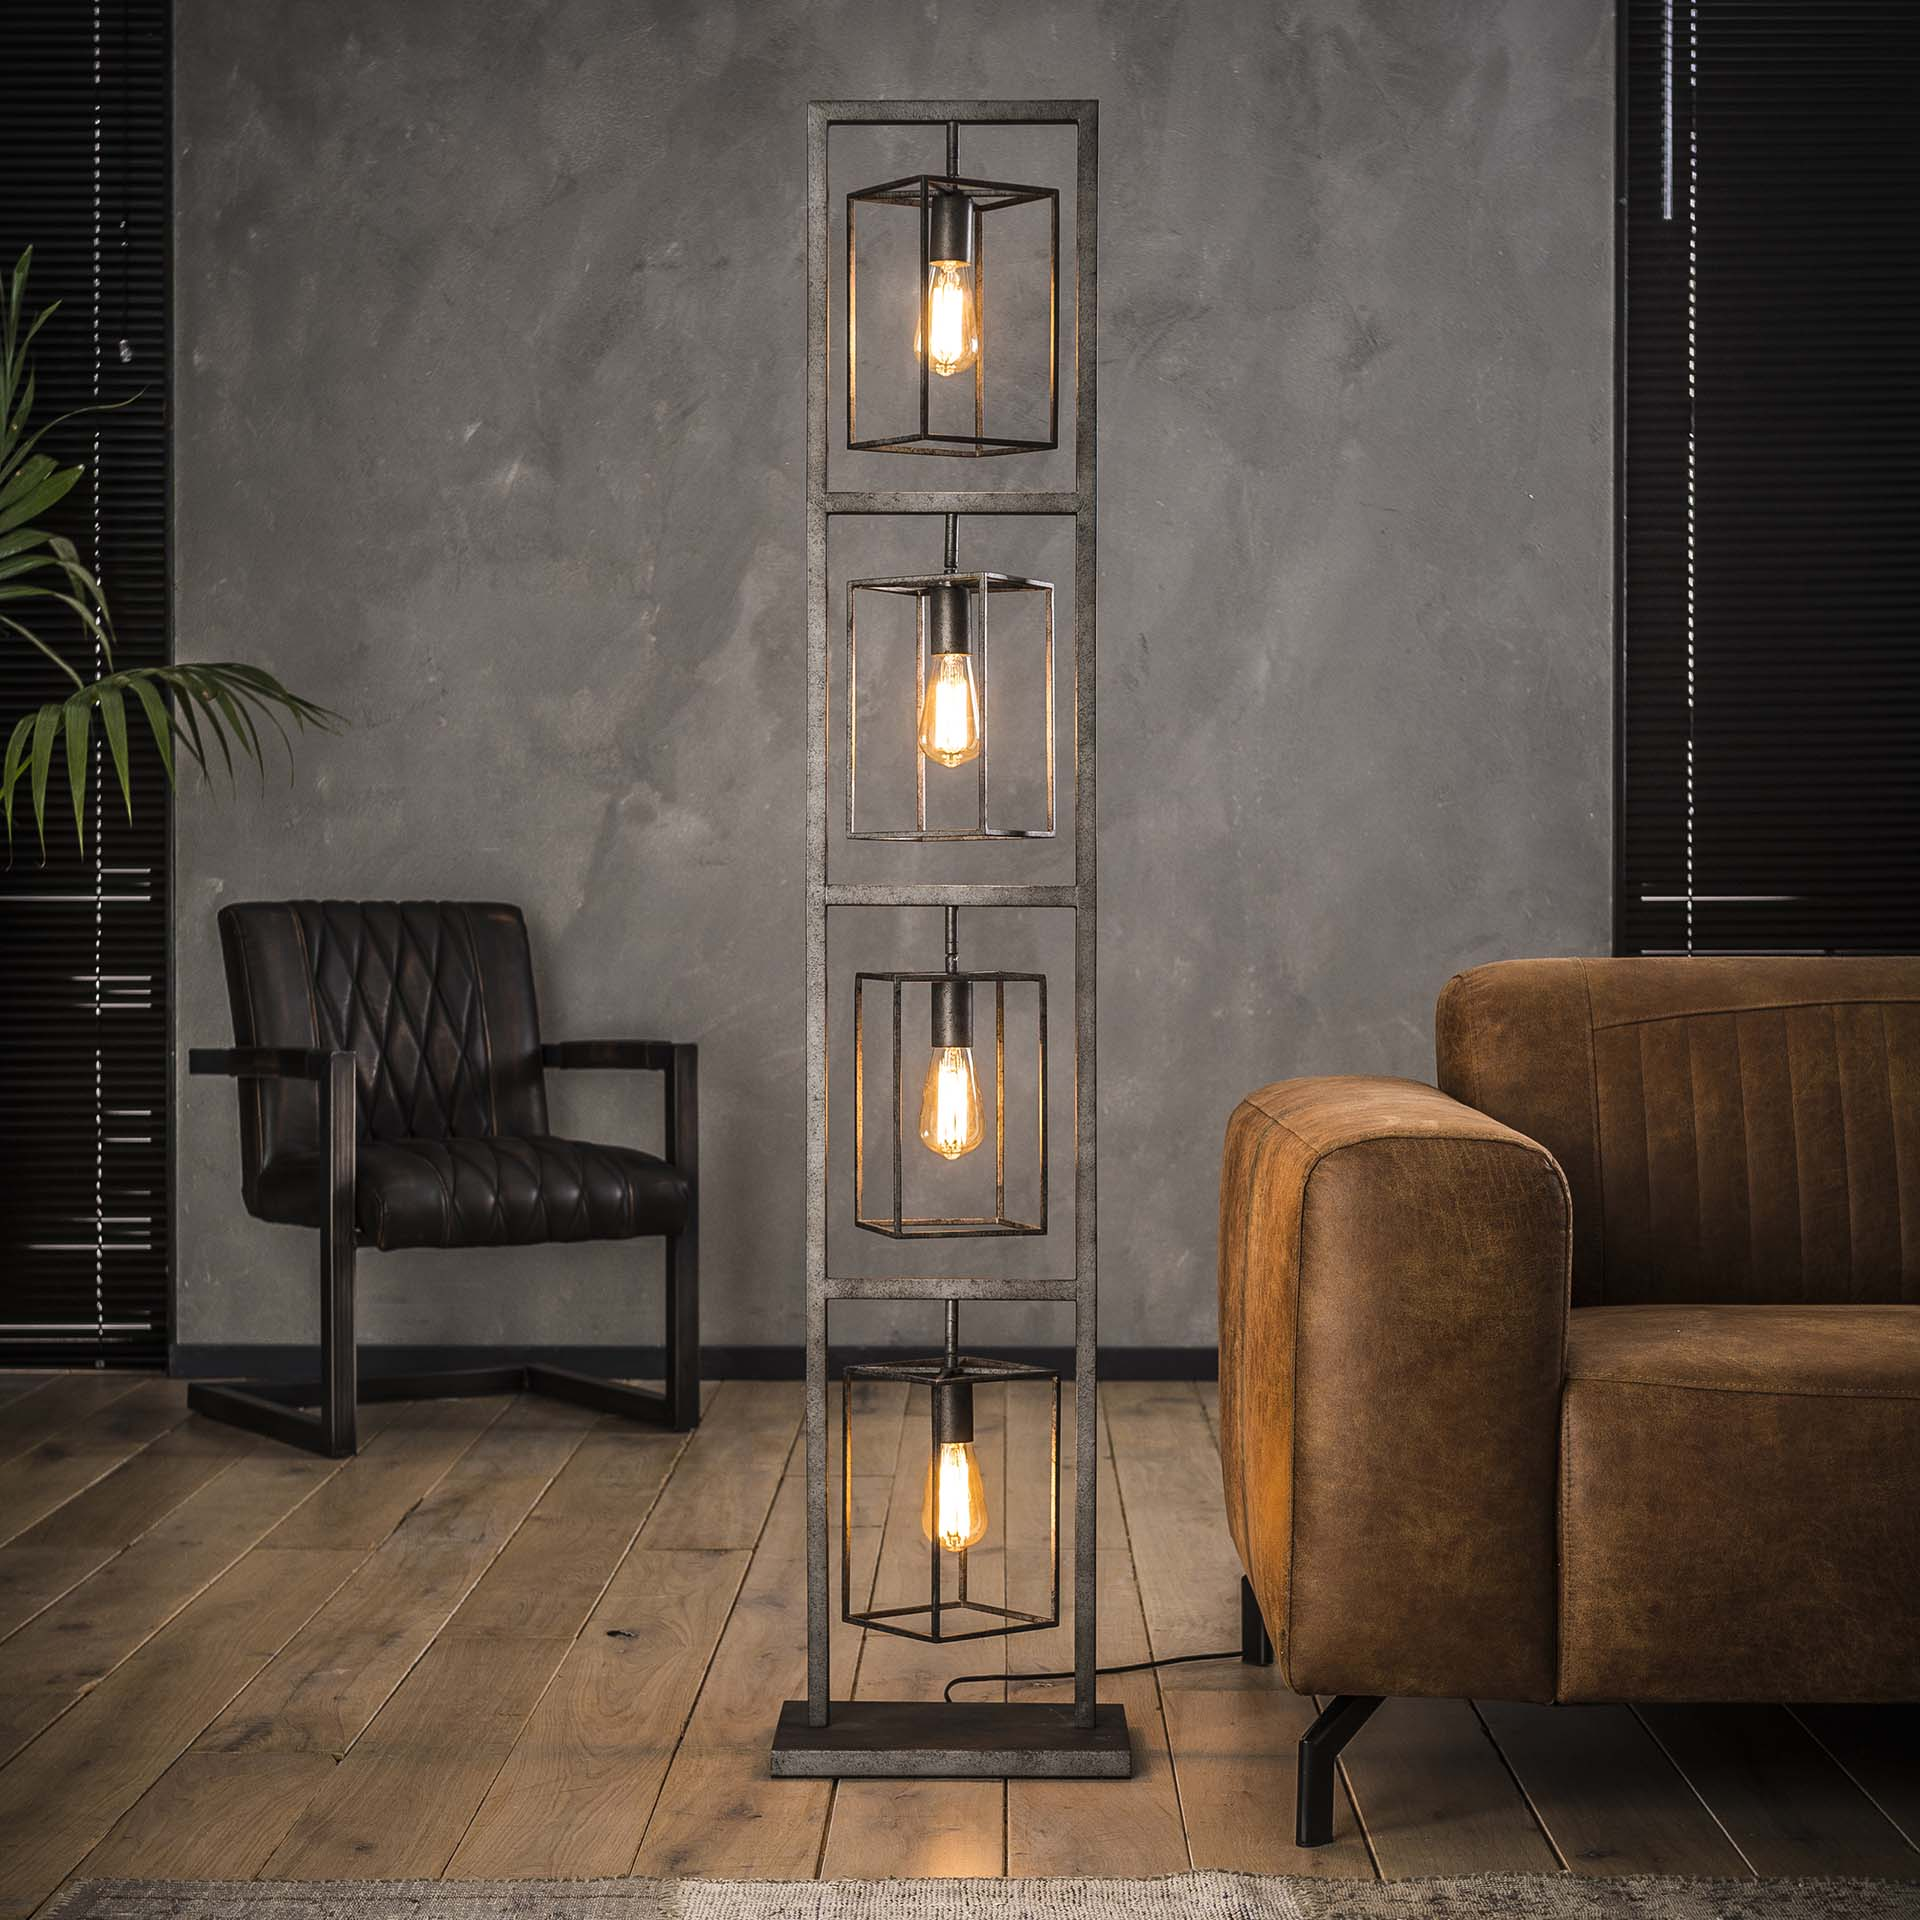 Stehlampe Stehleuchte Lampen Metall Vintage Turm 4 Flammig